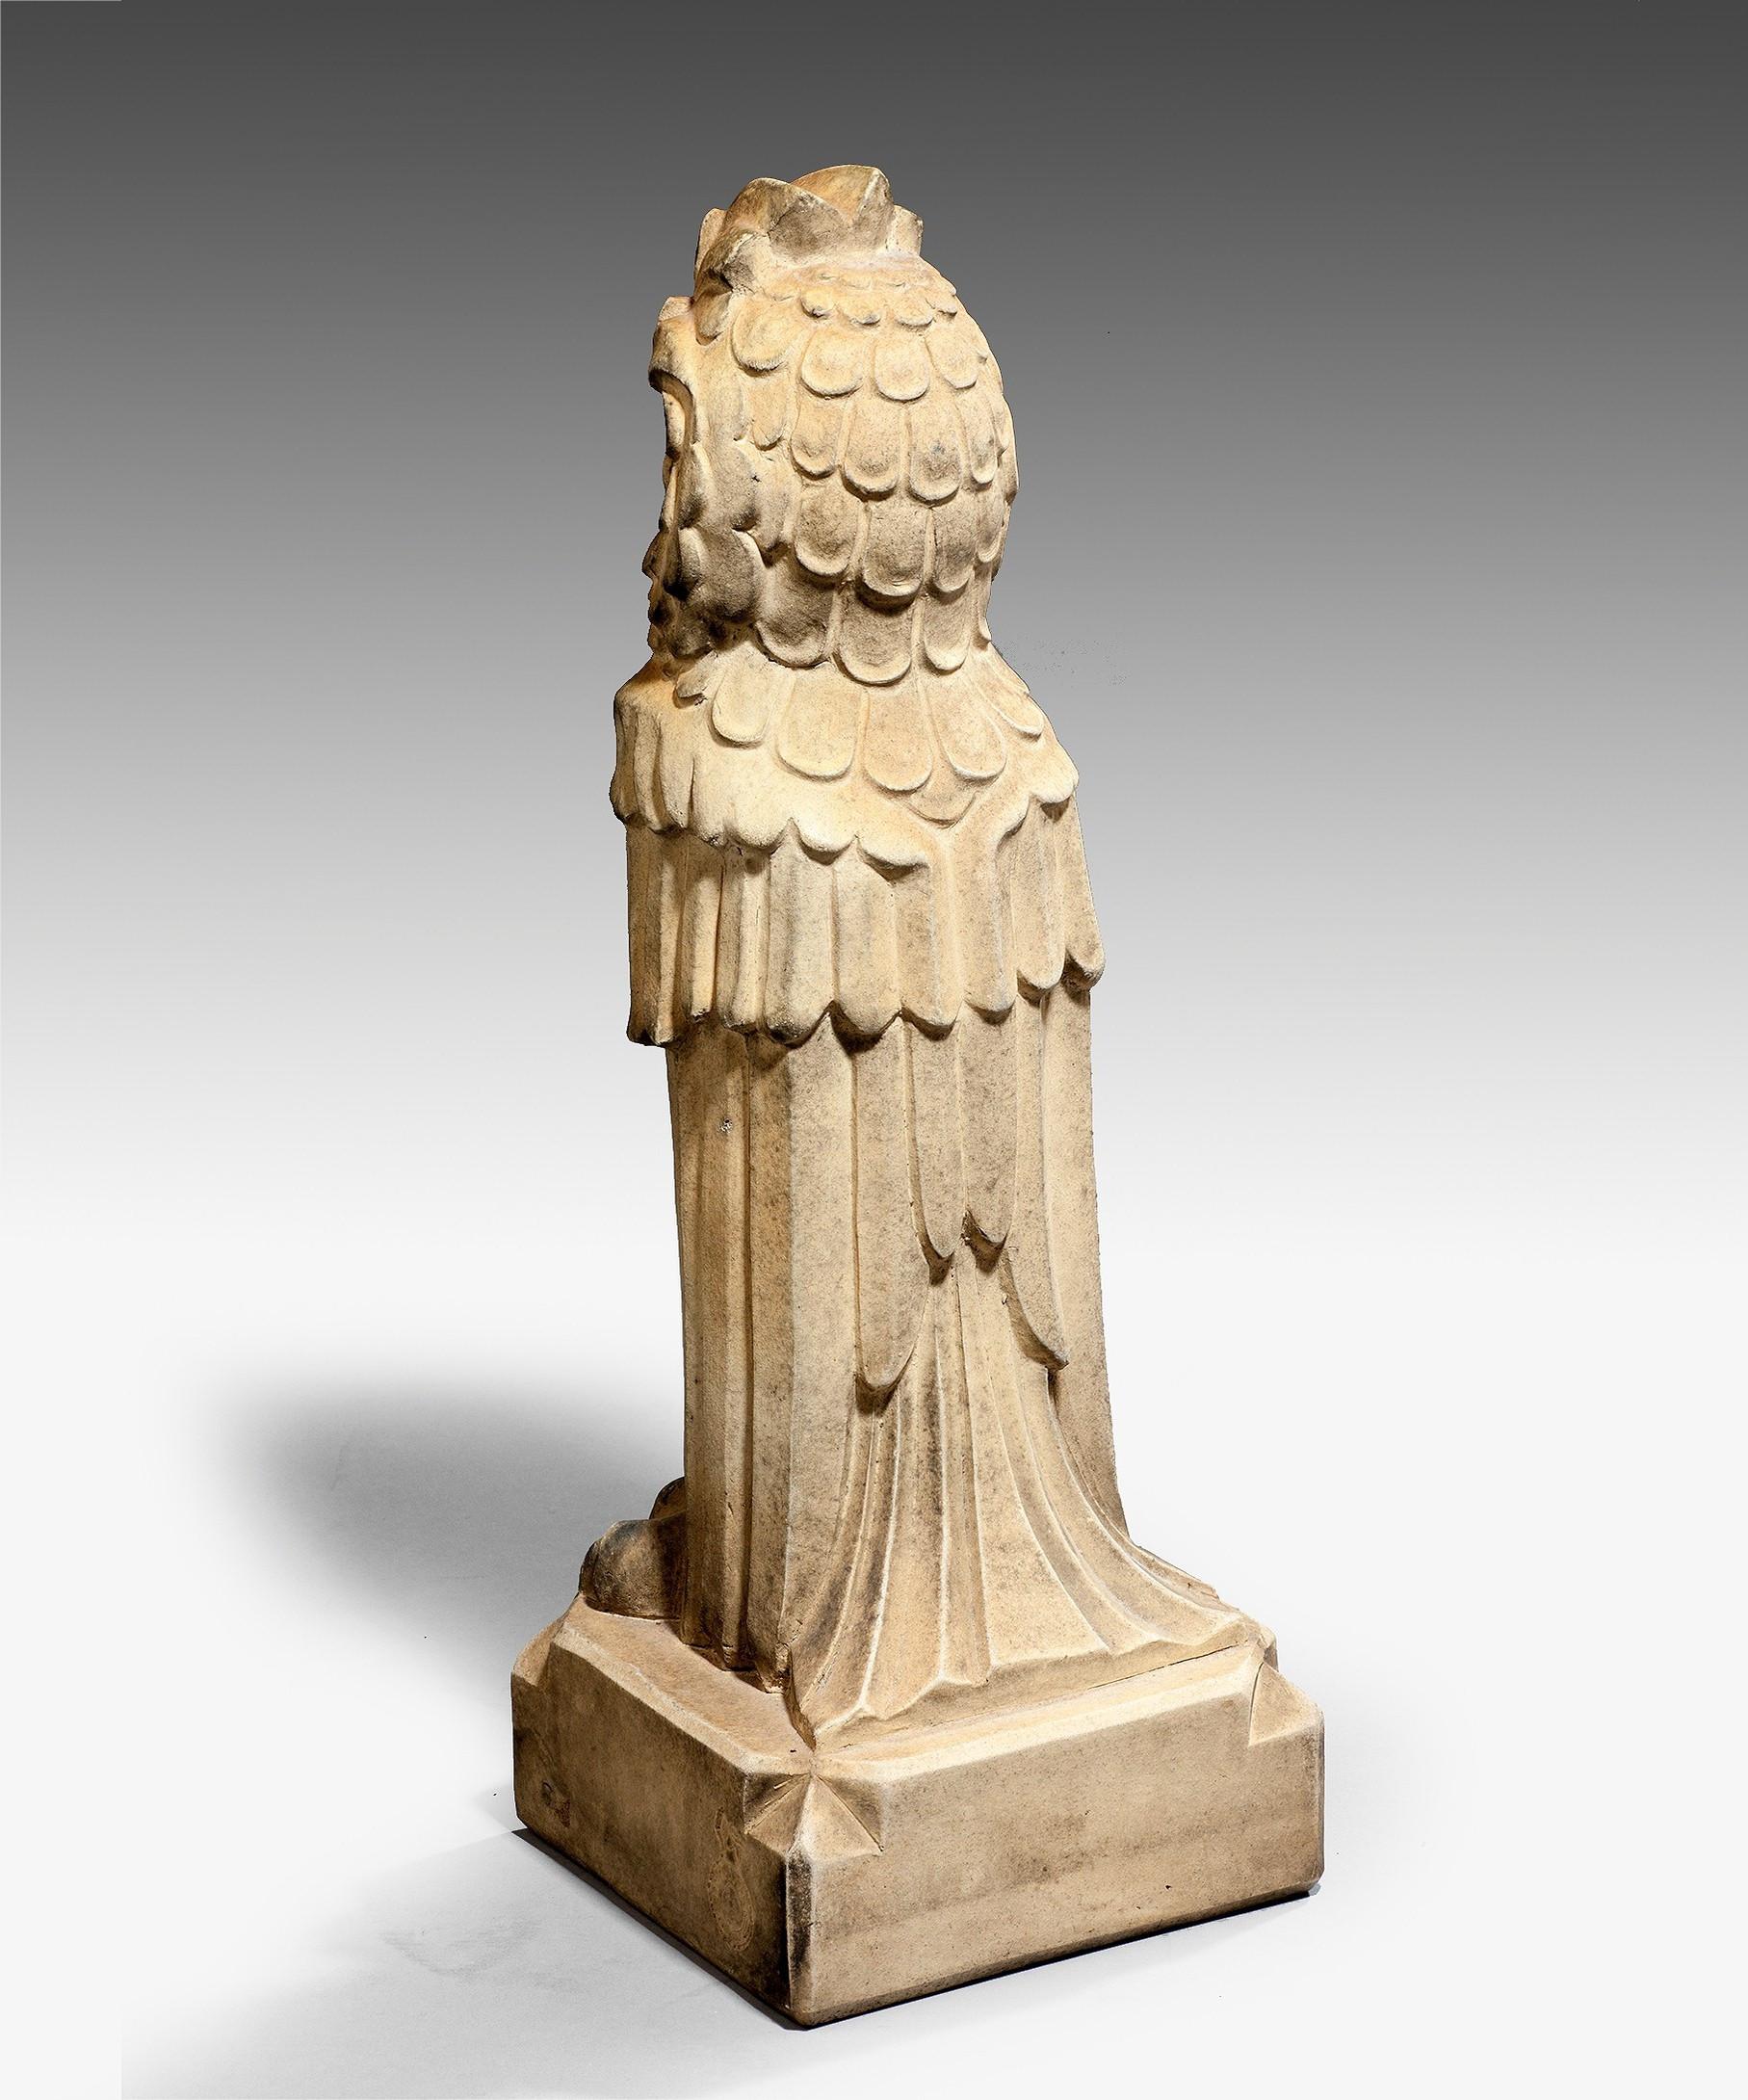 royal doulton vases 1900 of a royal doulton owl reindeer antiques regarding a royal doulton owl